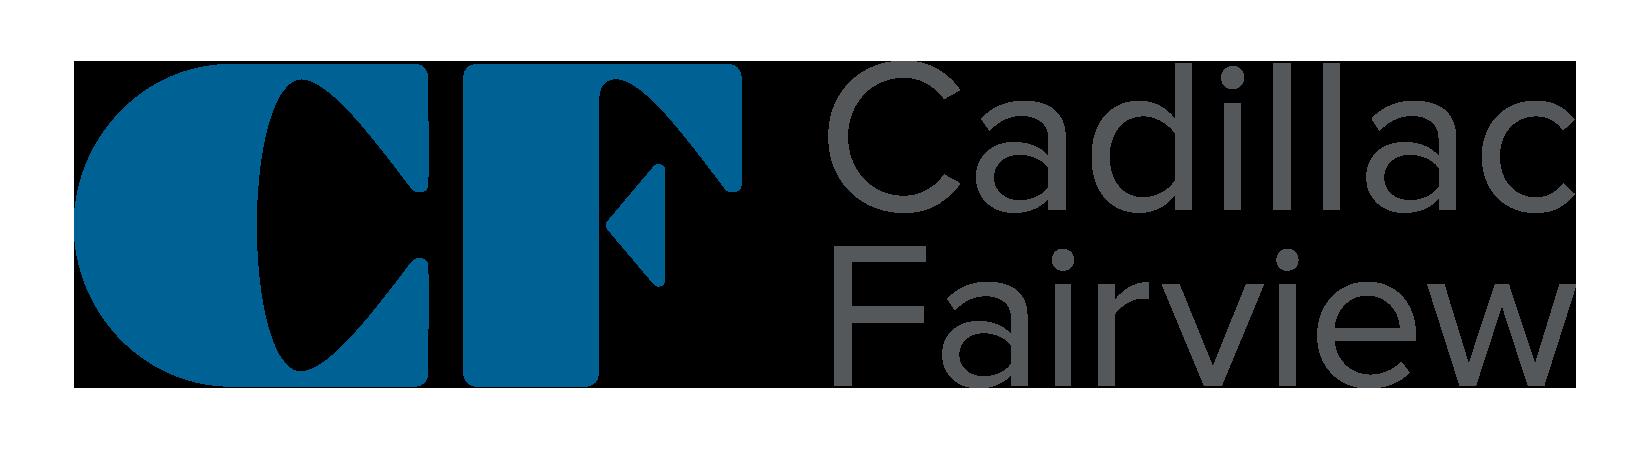 Cadillac Fairvew Logo.png